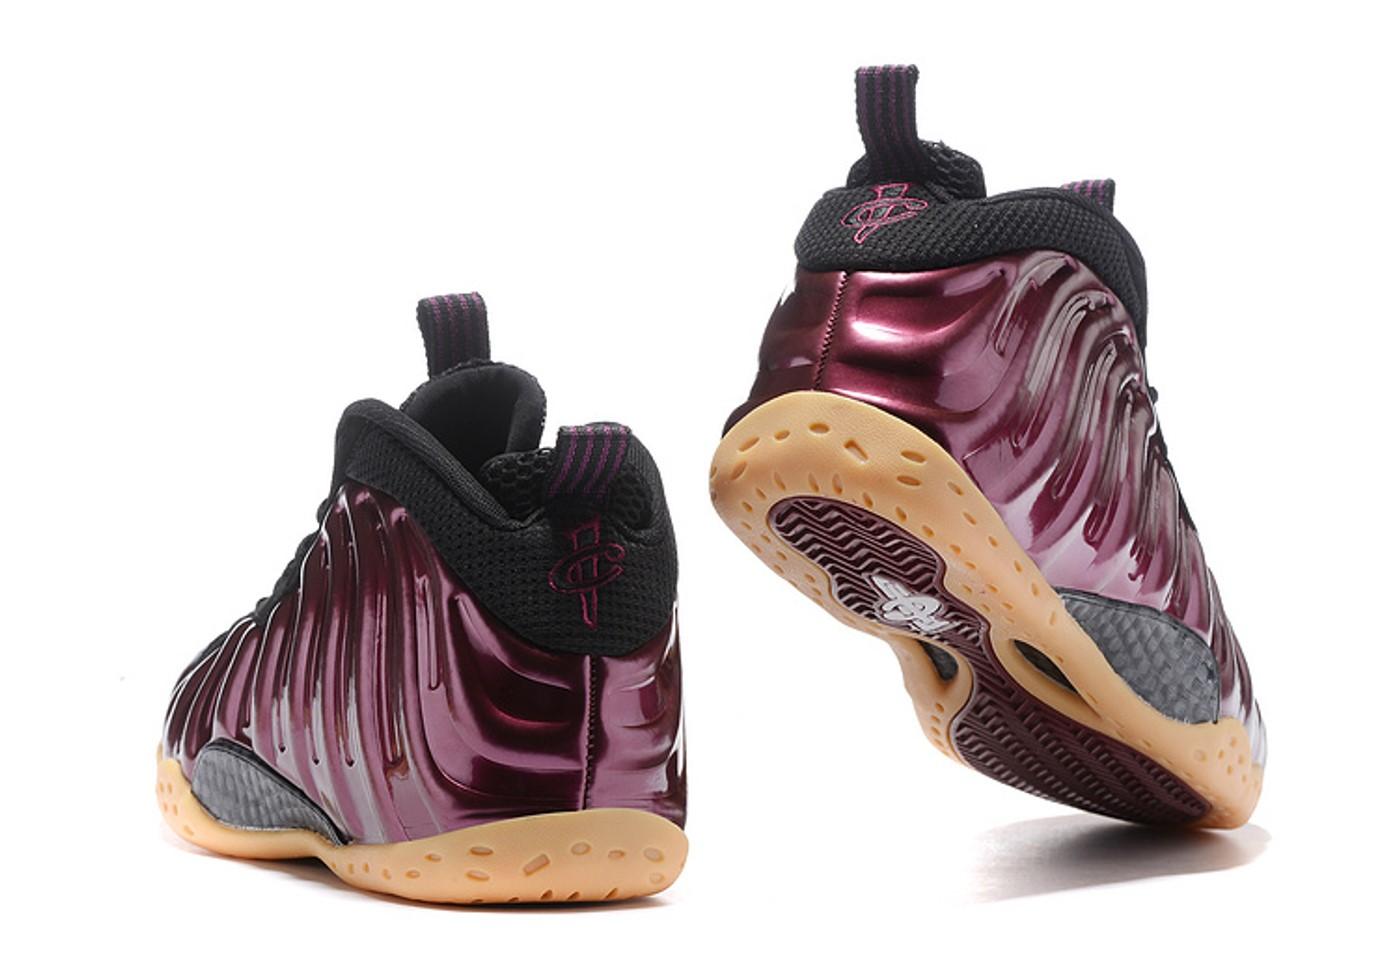 d52eb1315e2 Nike Air Foamposite One Night Maroon Gum Light Brown Black 314996 ...